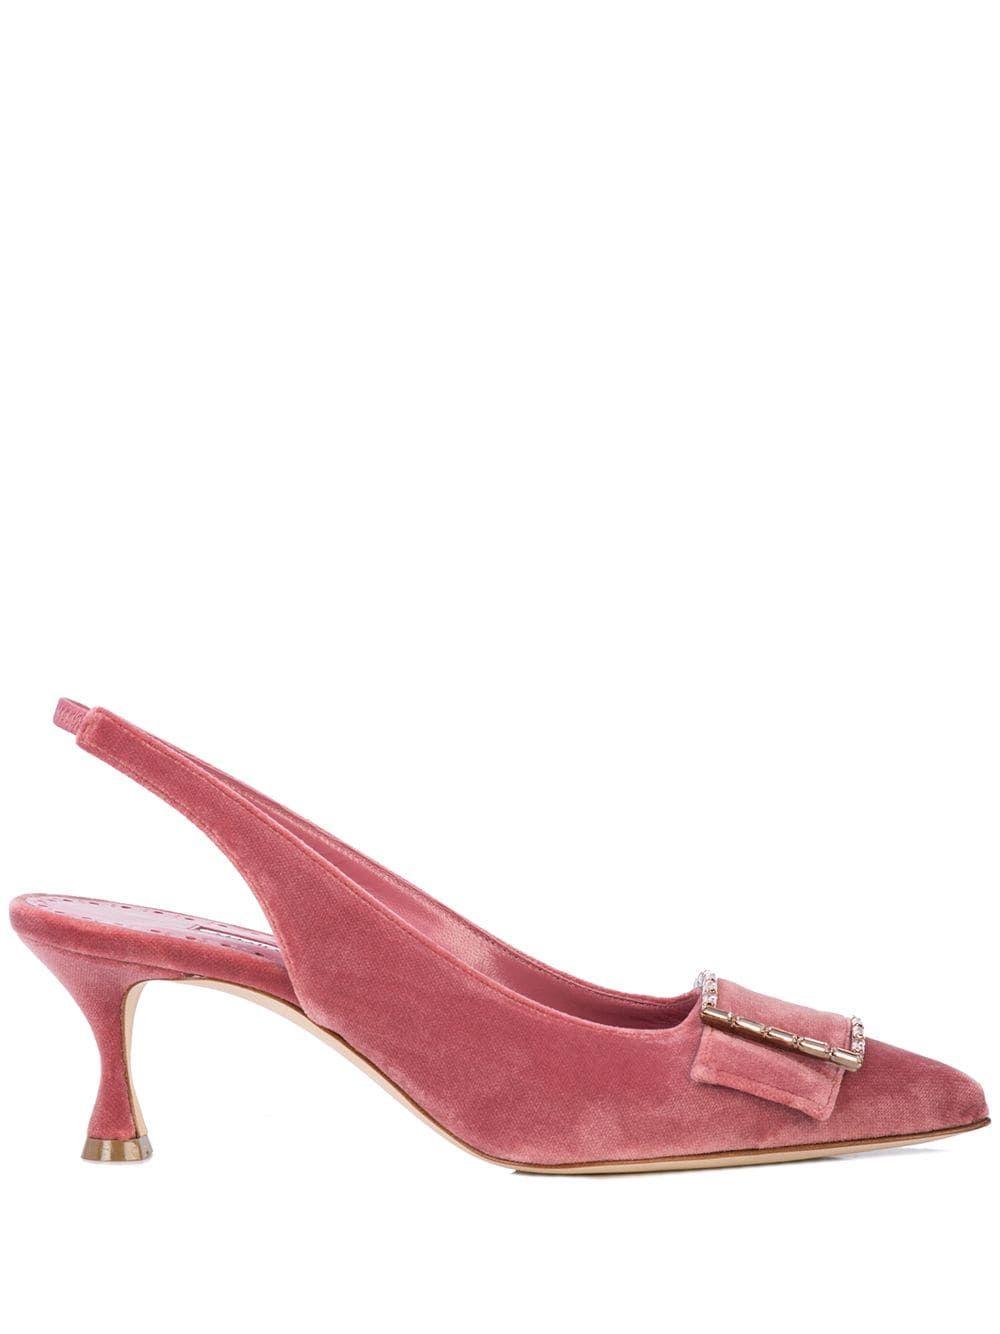 Designer Pumps For Women Manolo Blahnik Manolo Blahnik Heels Blahnik